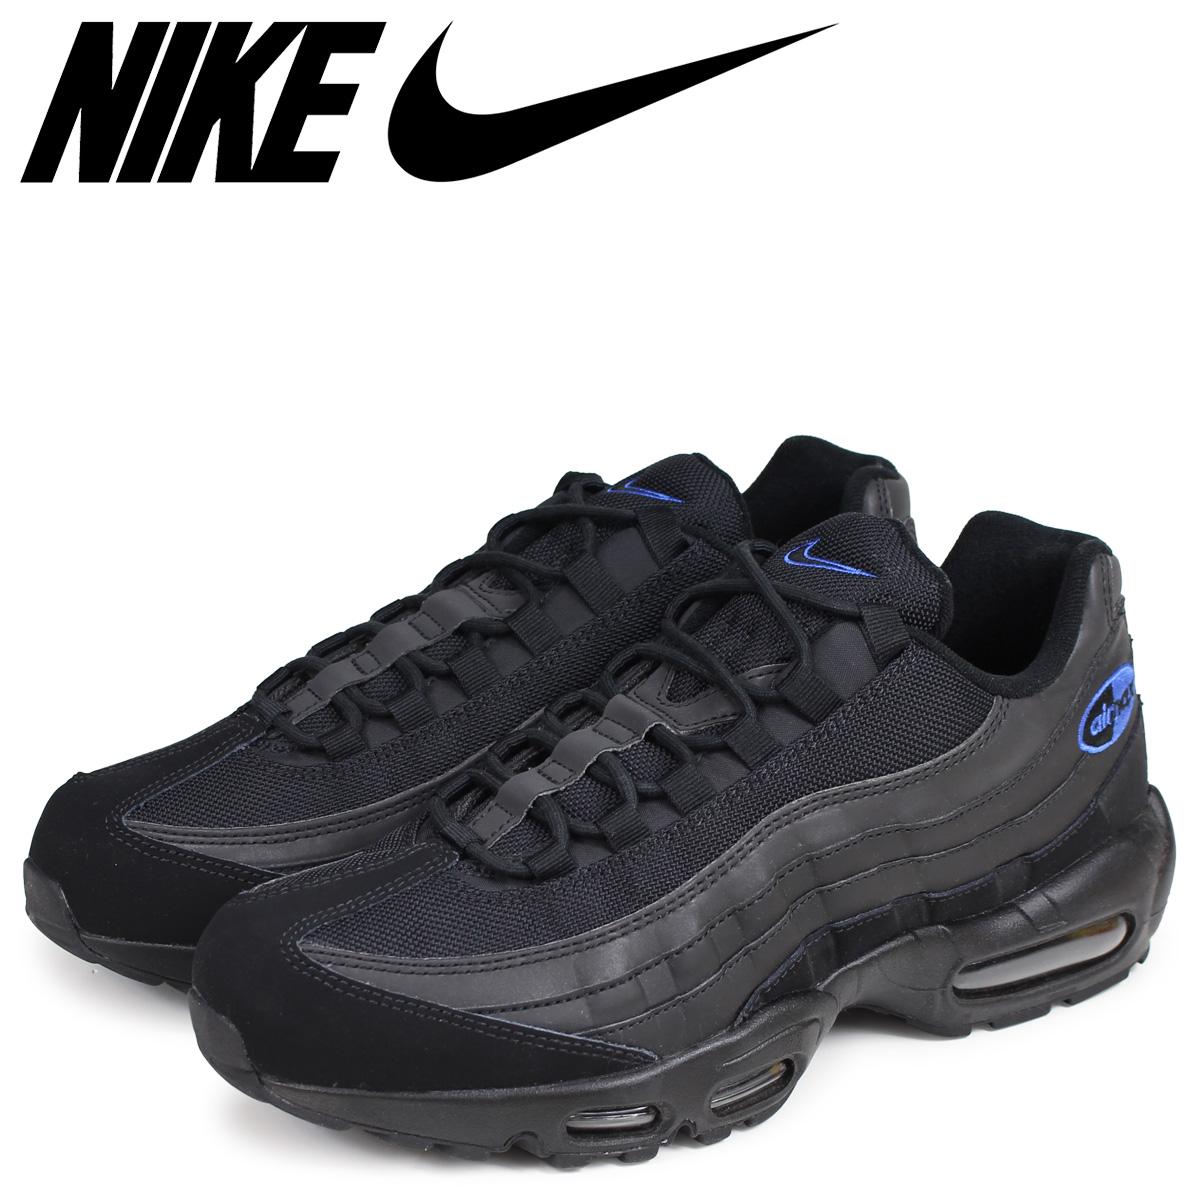 NIKE Kie Ney AMAX 95 sneakers men AIR MAX 95 PREMIUM SE black black BQ3168 002